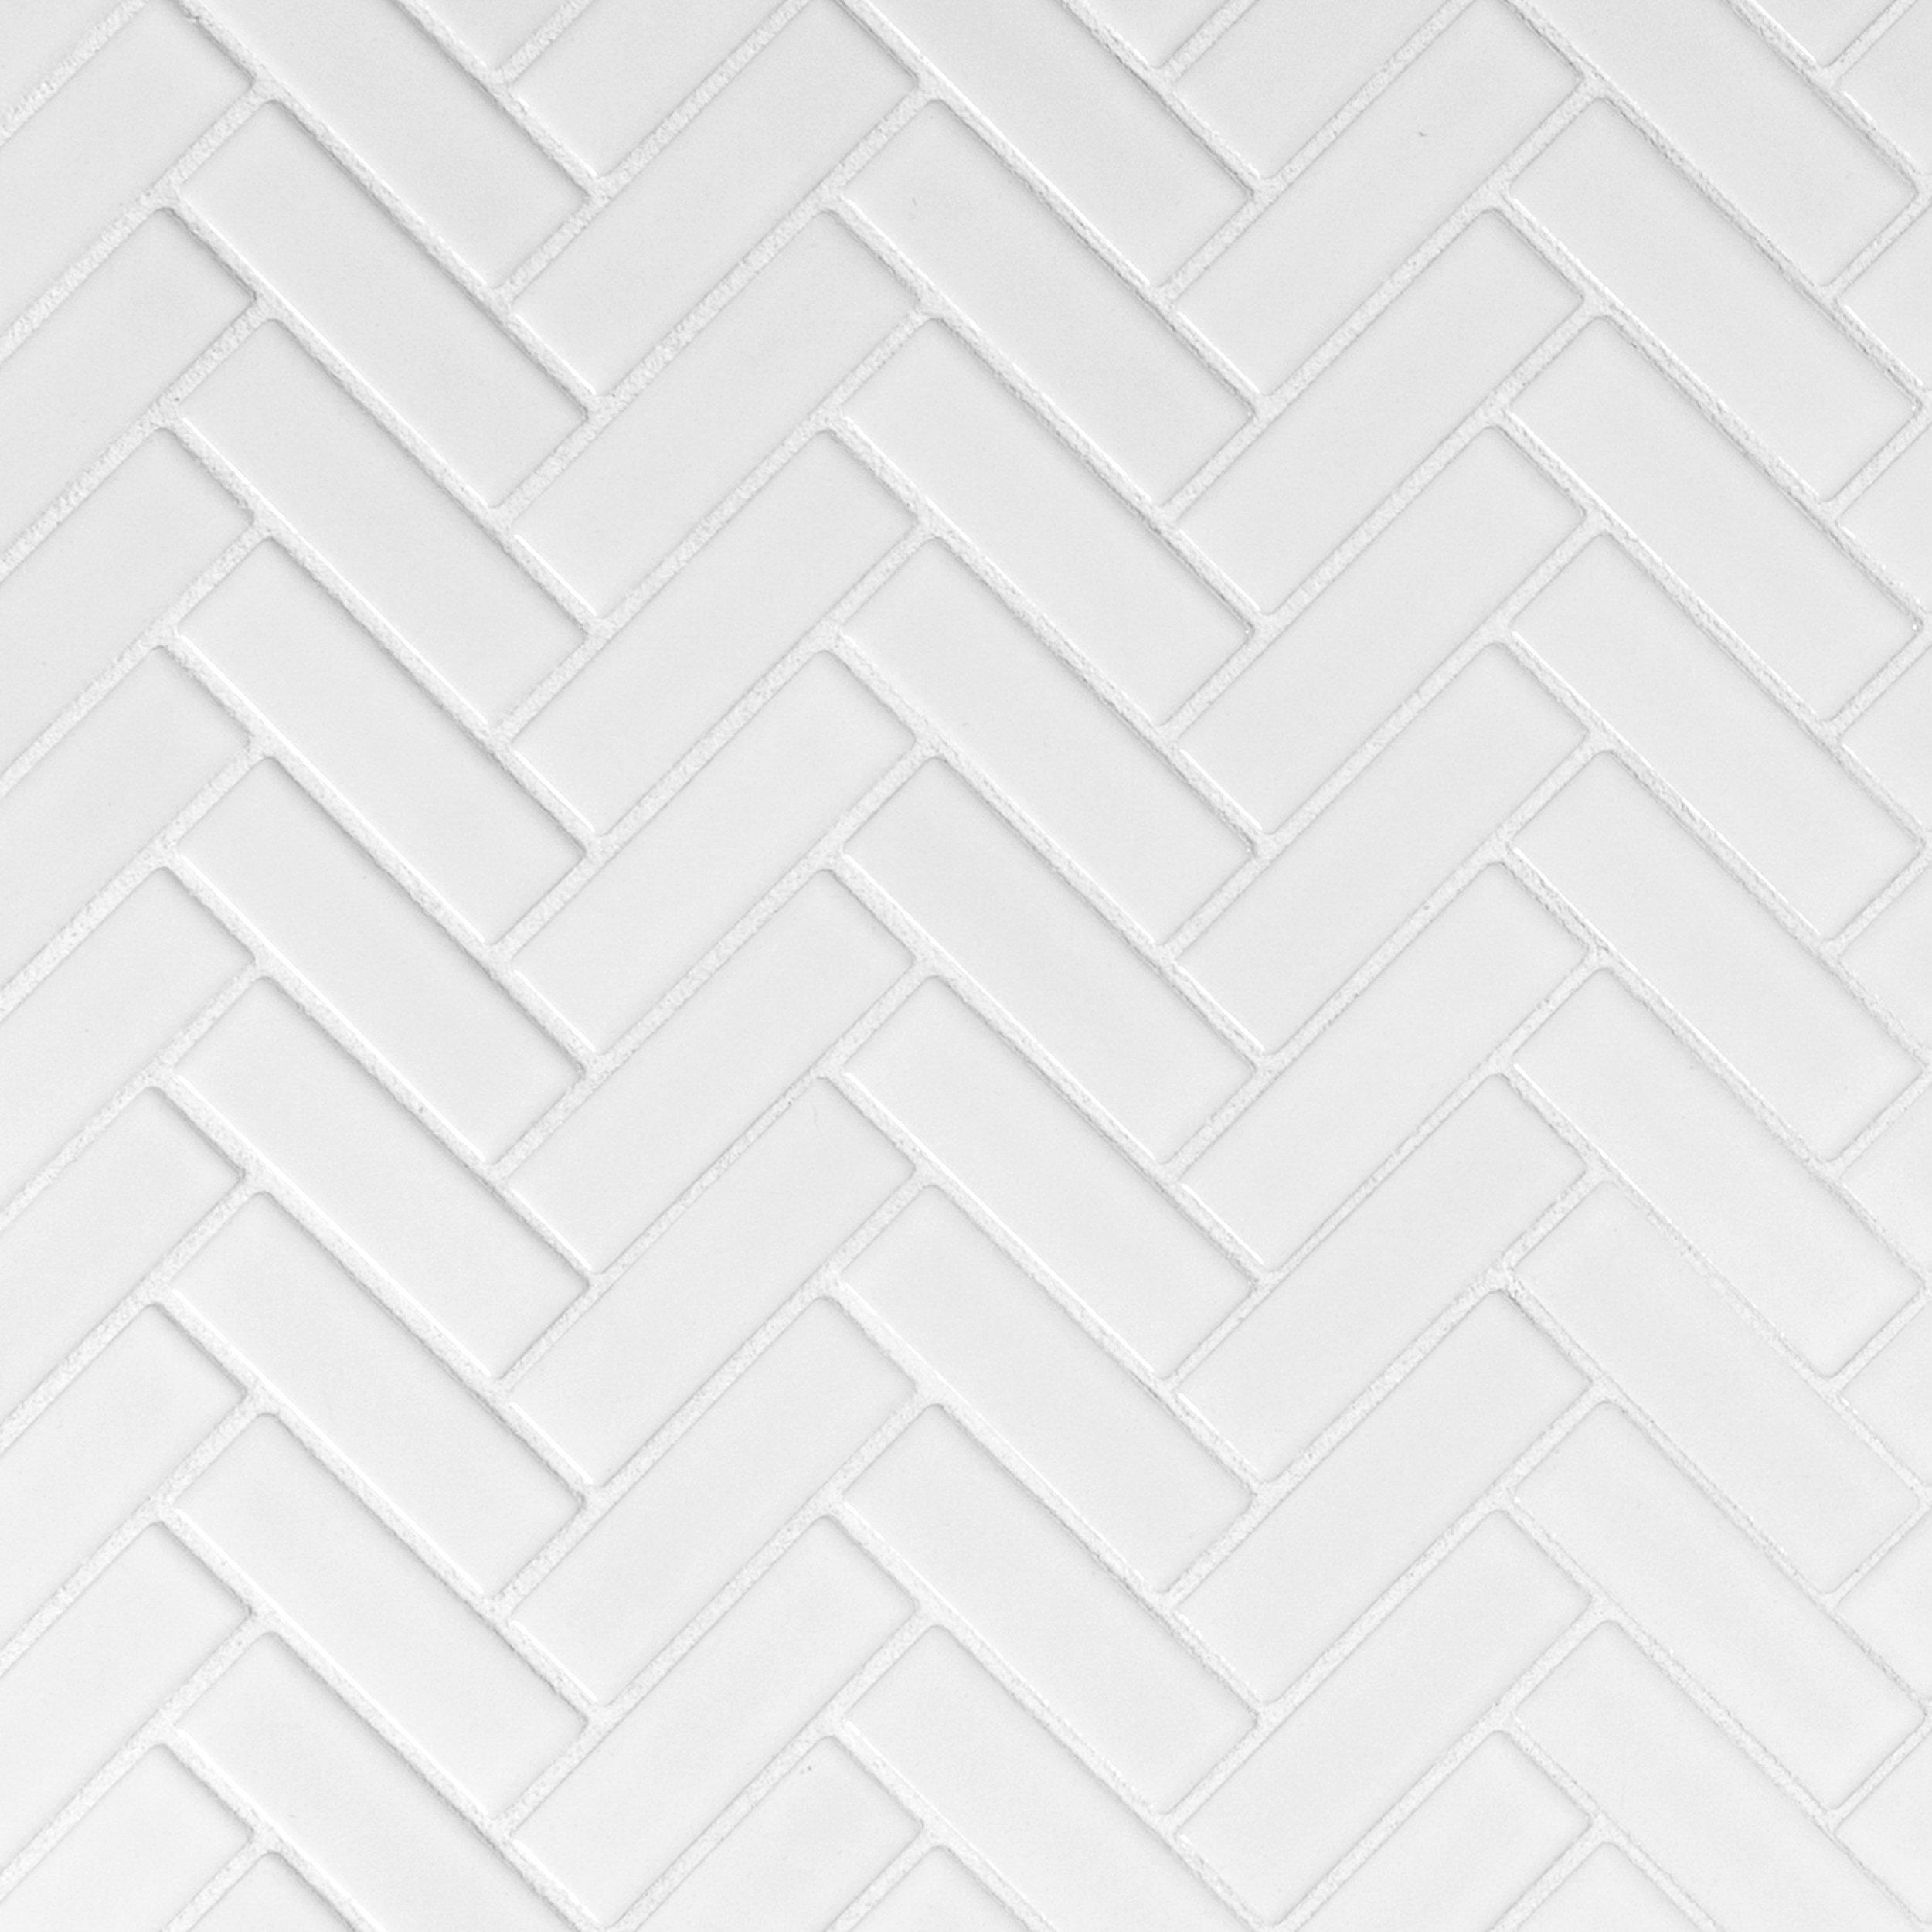 Tile bathroom floor decor white herringbone porcelain mosaic dailygadgetfo Choice Image